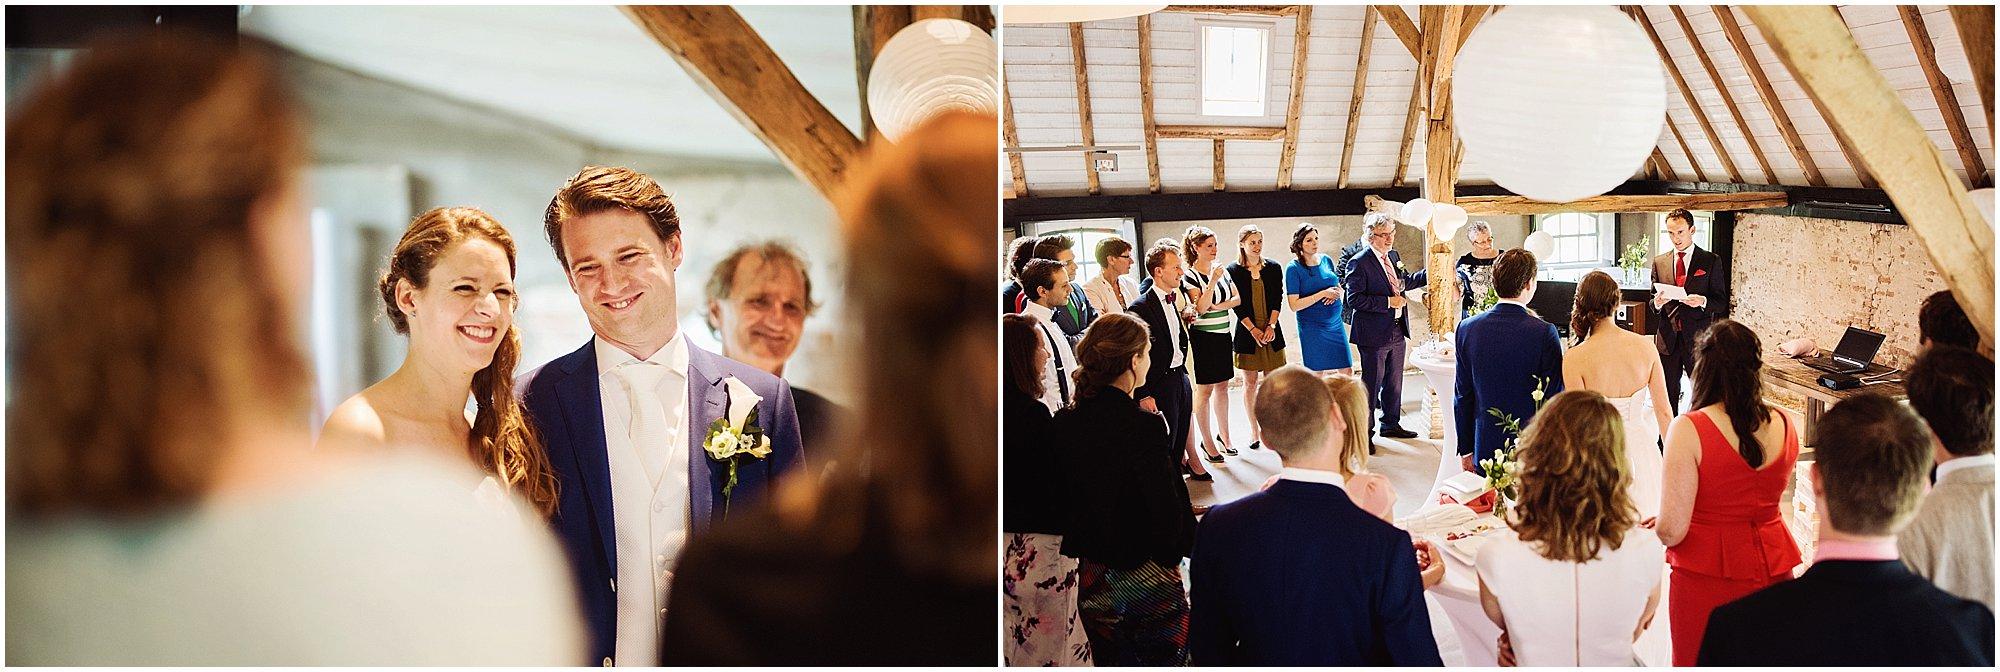 Bruidsreportage Noord-Brabant, bruidsreportage Ulvenhart, bruidsfotografie Noord-Brabant, bruidsfotograaf Noord-Brabant, bruidsfotografie Breda, bruidsfotografie Ulvenhout